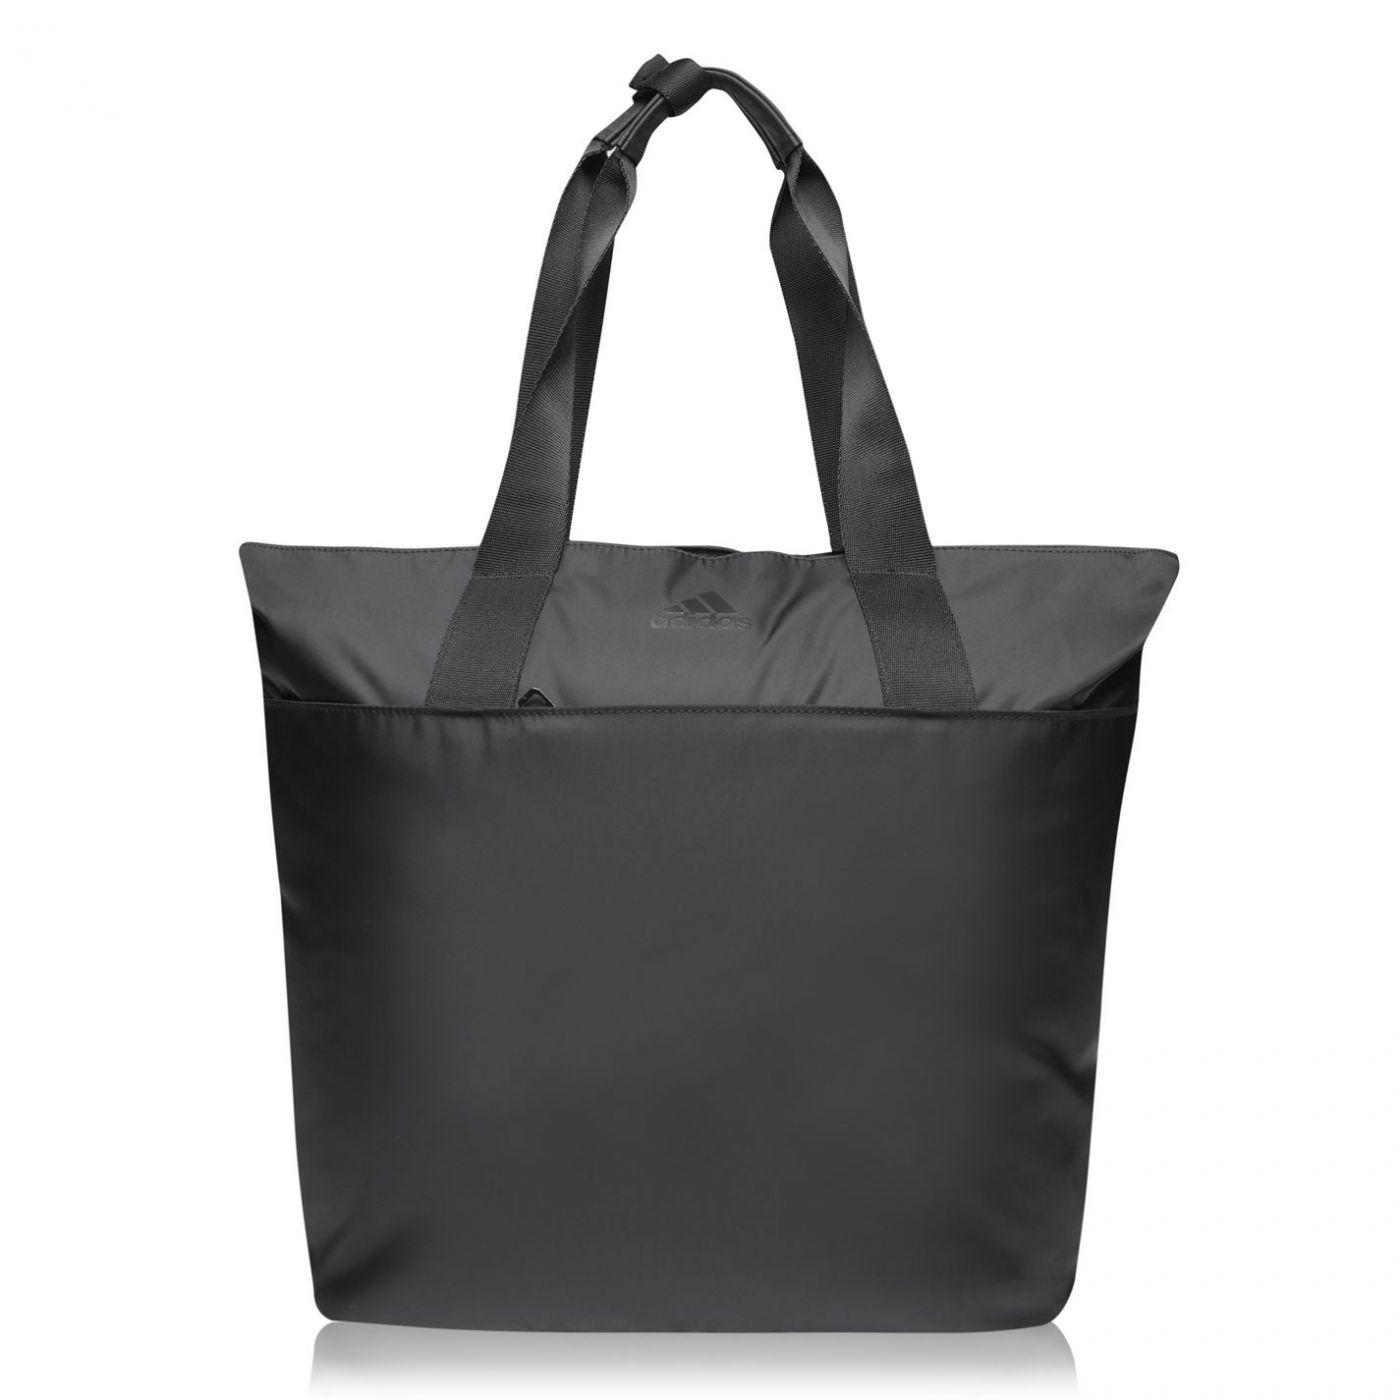 Adidas ID Tote Bag